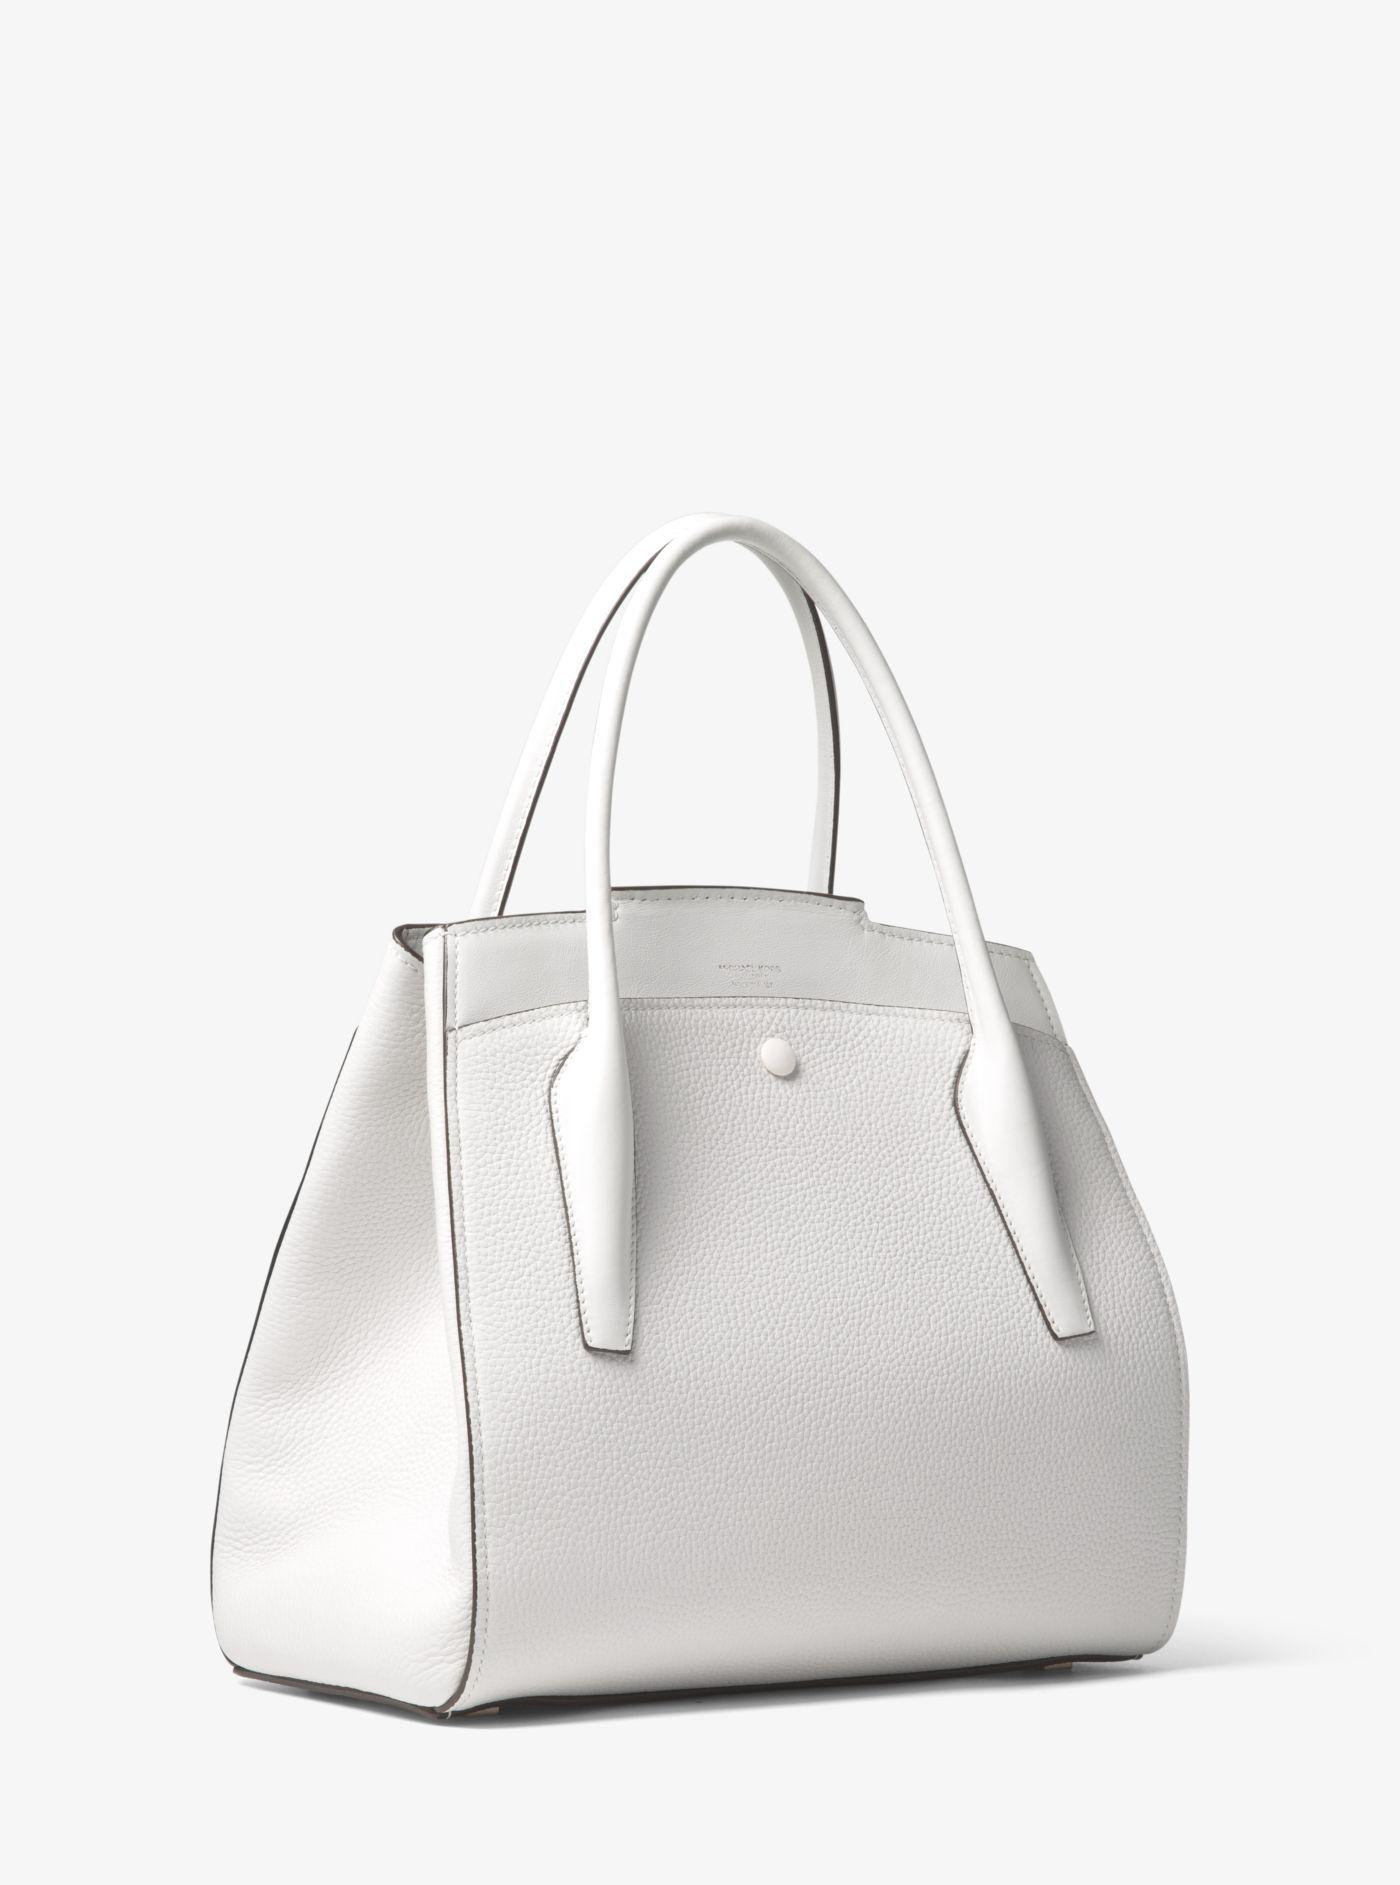 9b279516bc16d0 ... sale lyst michael kors bancroft large pebbled calf leather satchel in  white 05aa3 4d97e ...